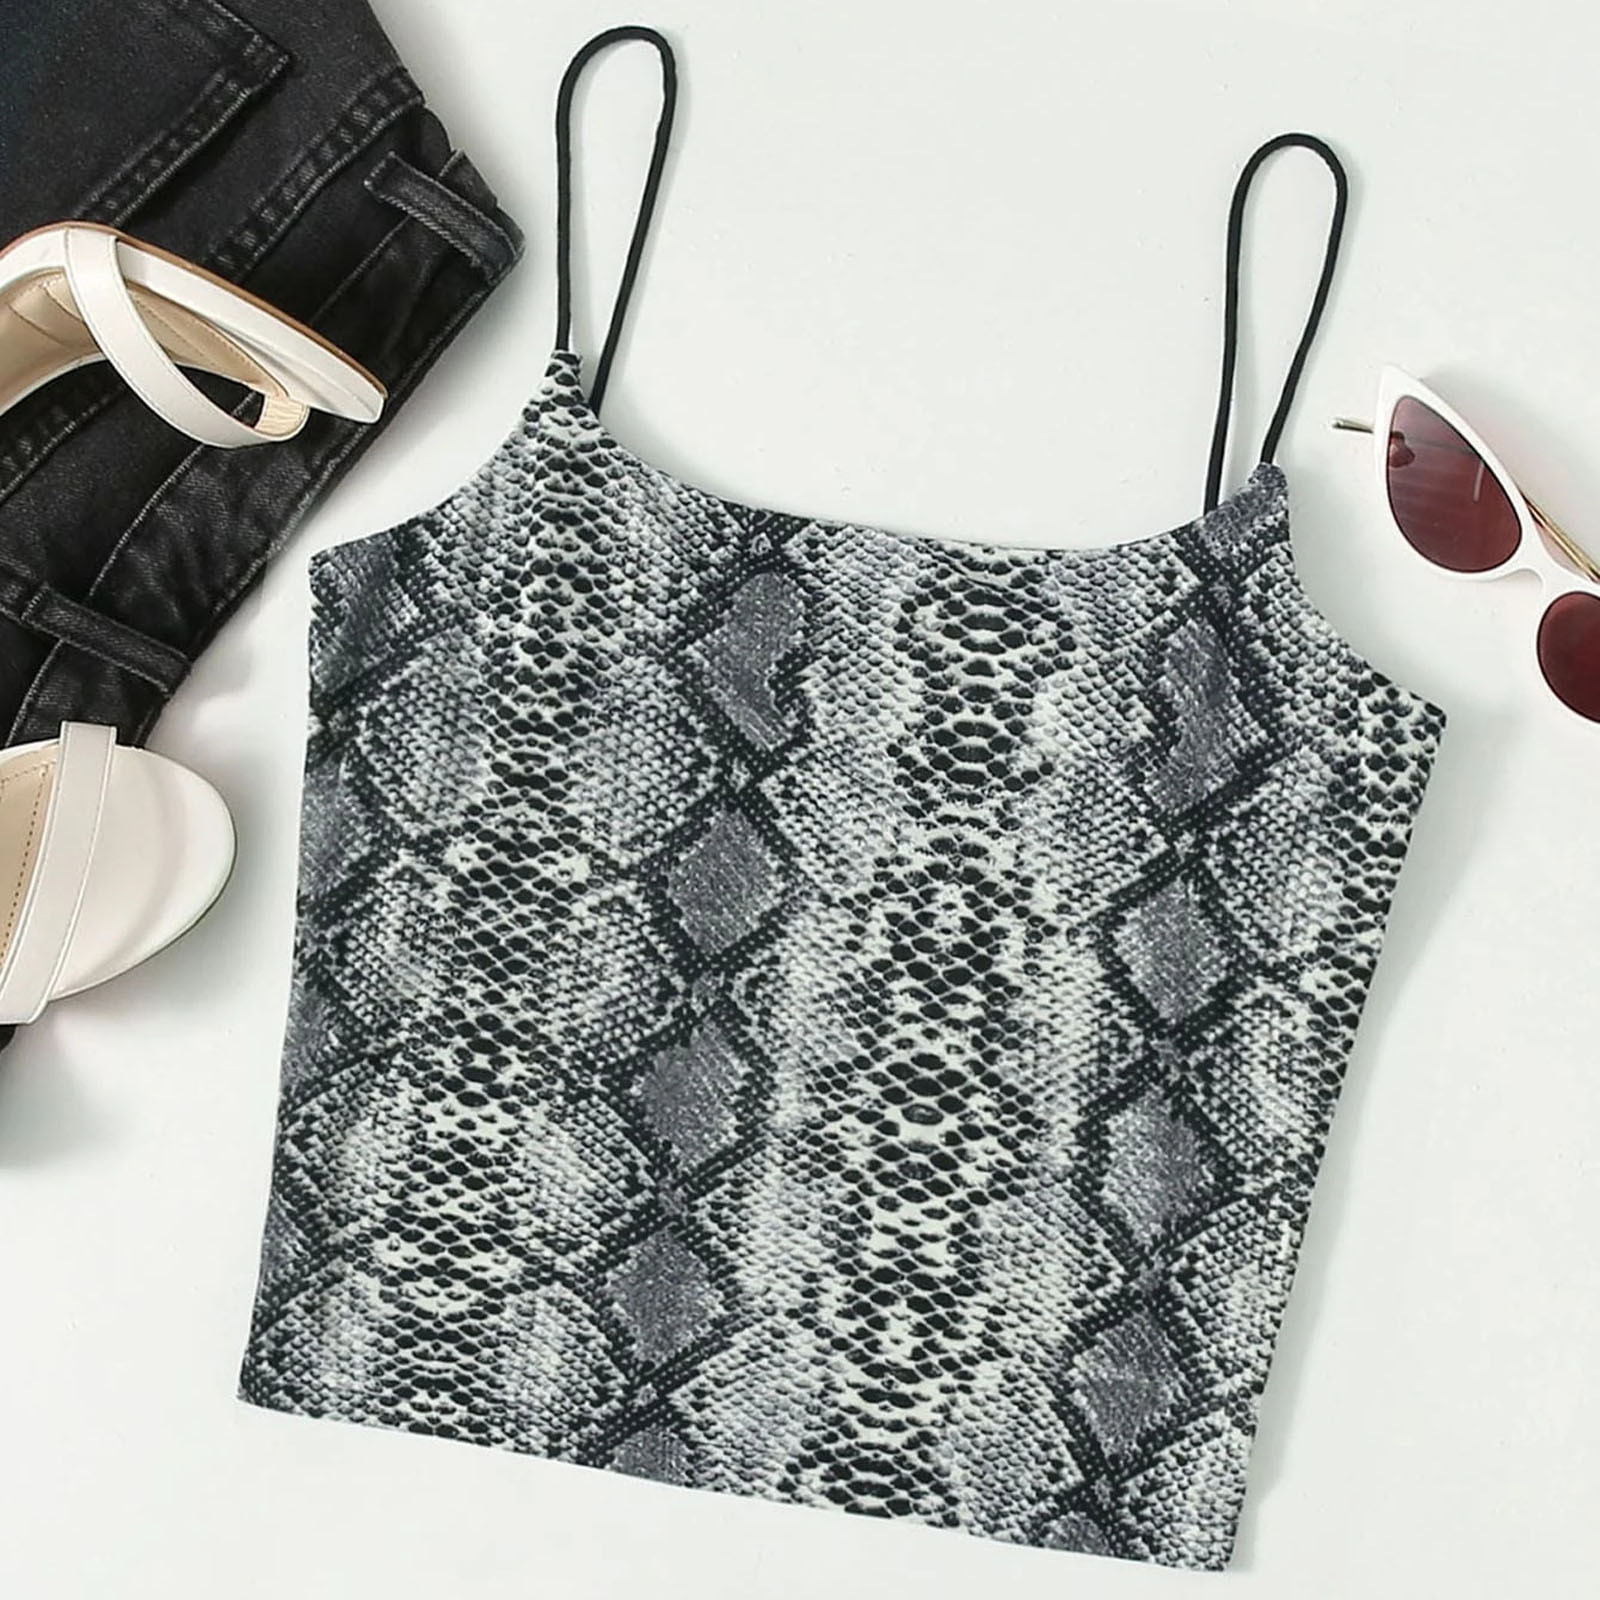 Backless Tops Crop-Top Print Sexy Leopard Women Short Bandage Party-Vest Cross-Tanks